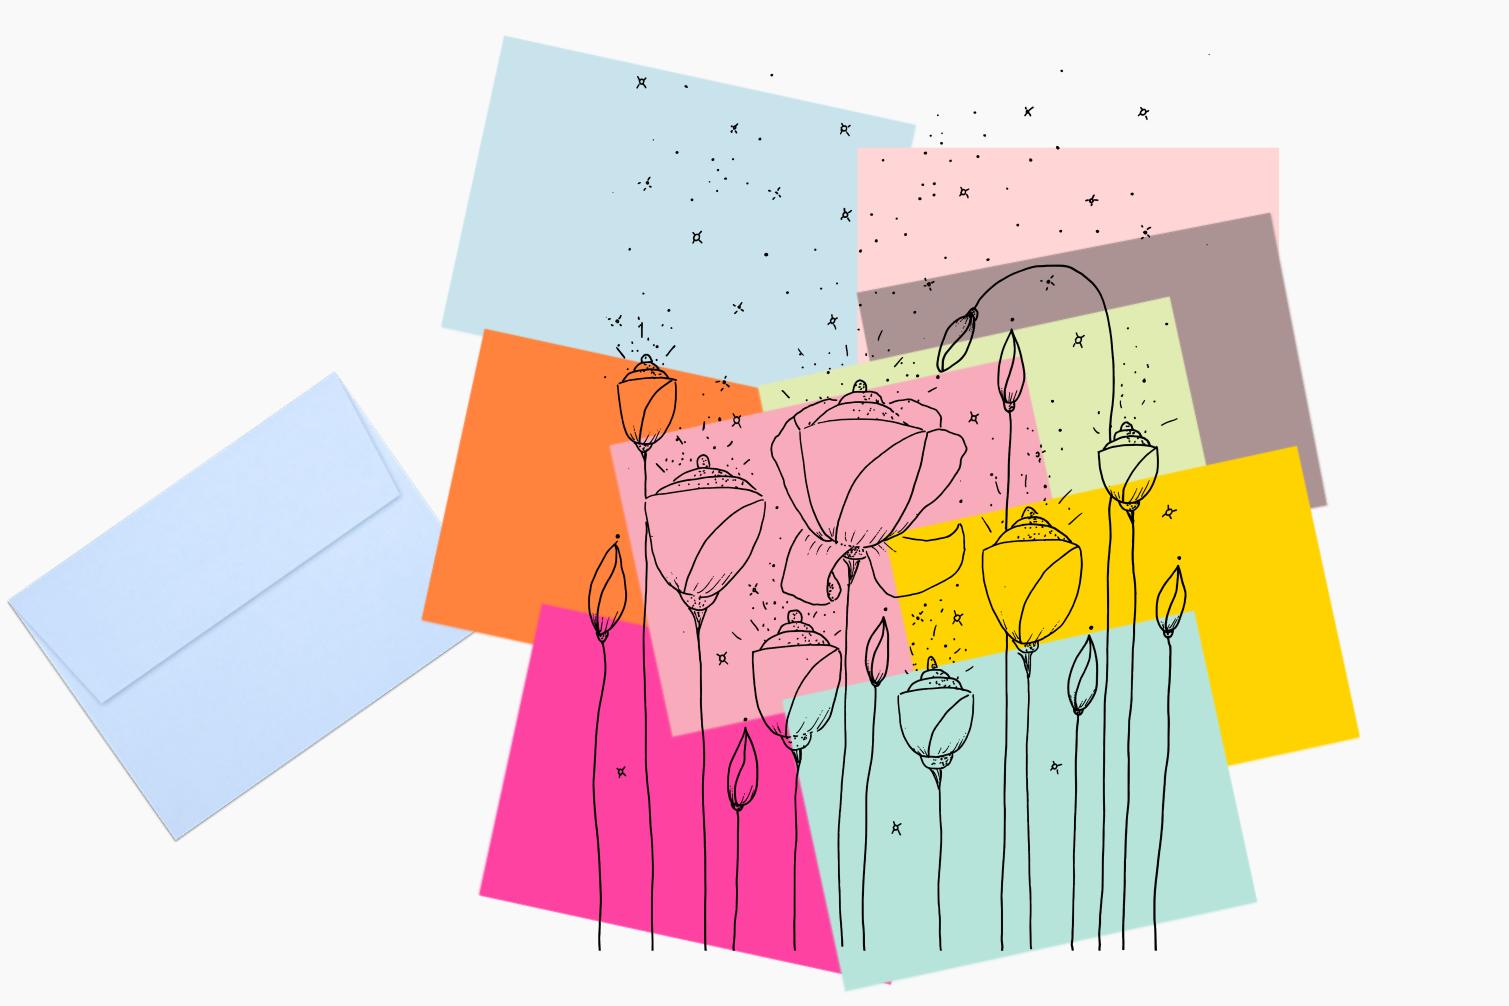 Light Flower Doodle Art, A1, SVG example image 6